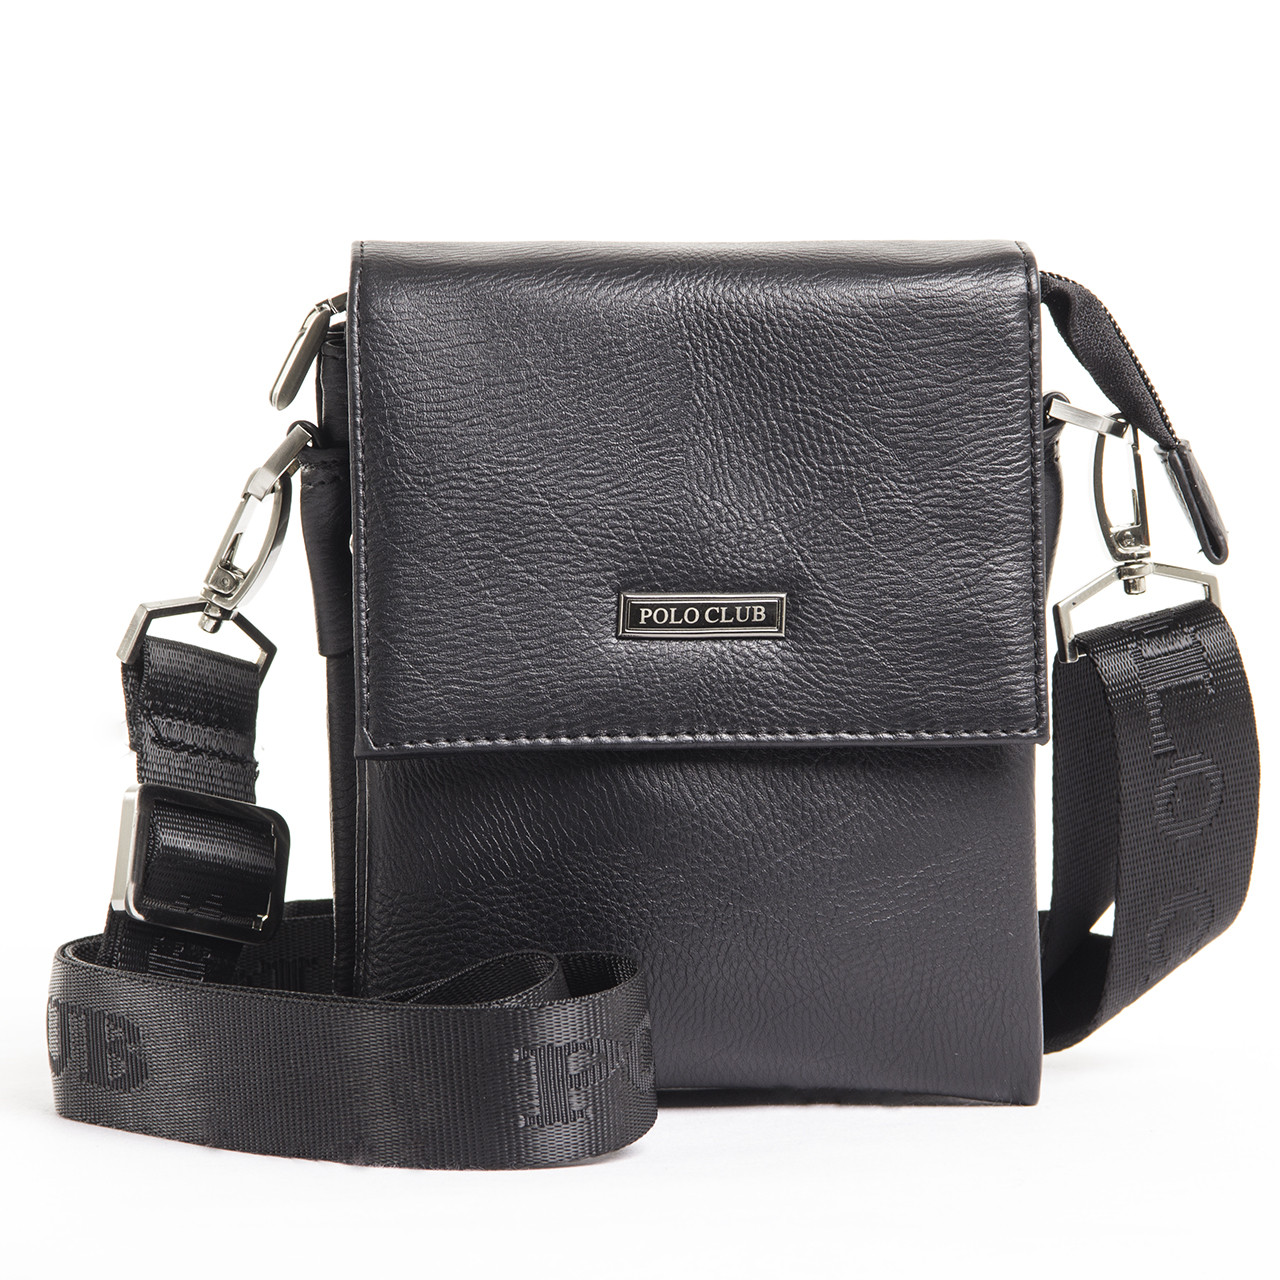 Мужская сумка POLO CLUB чёрный спилак 14х17х8 клапан ручка  кс023-1ч